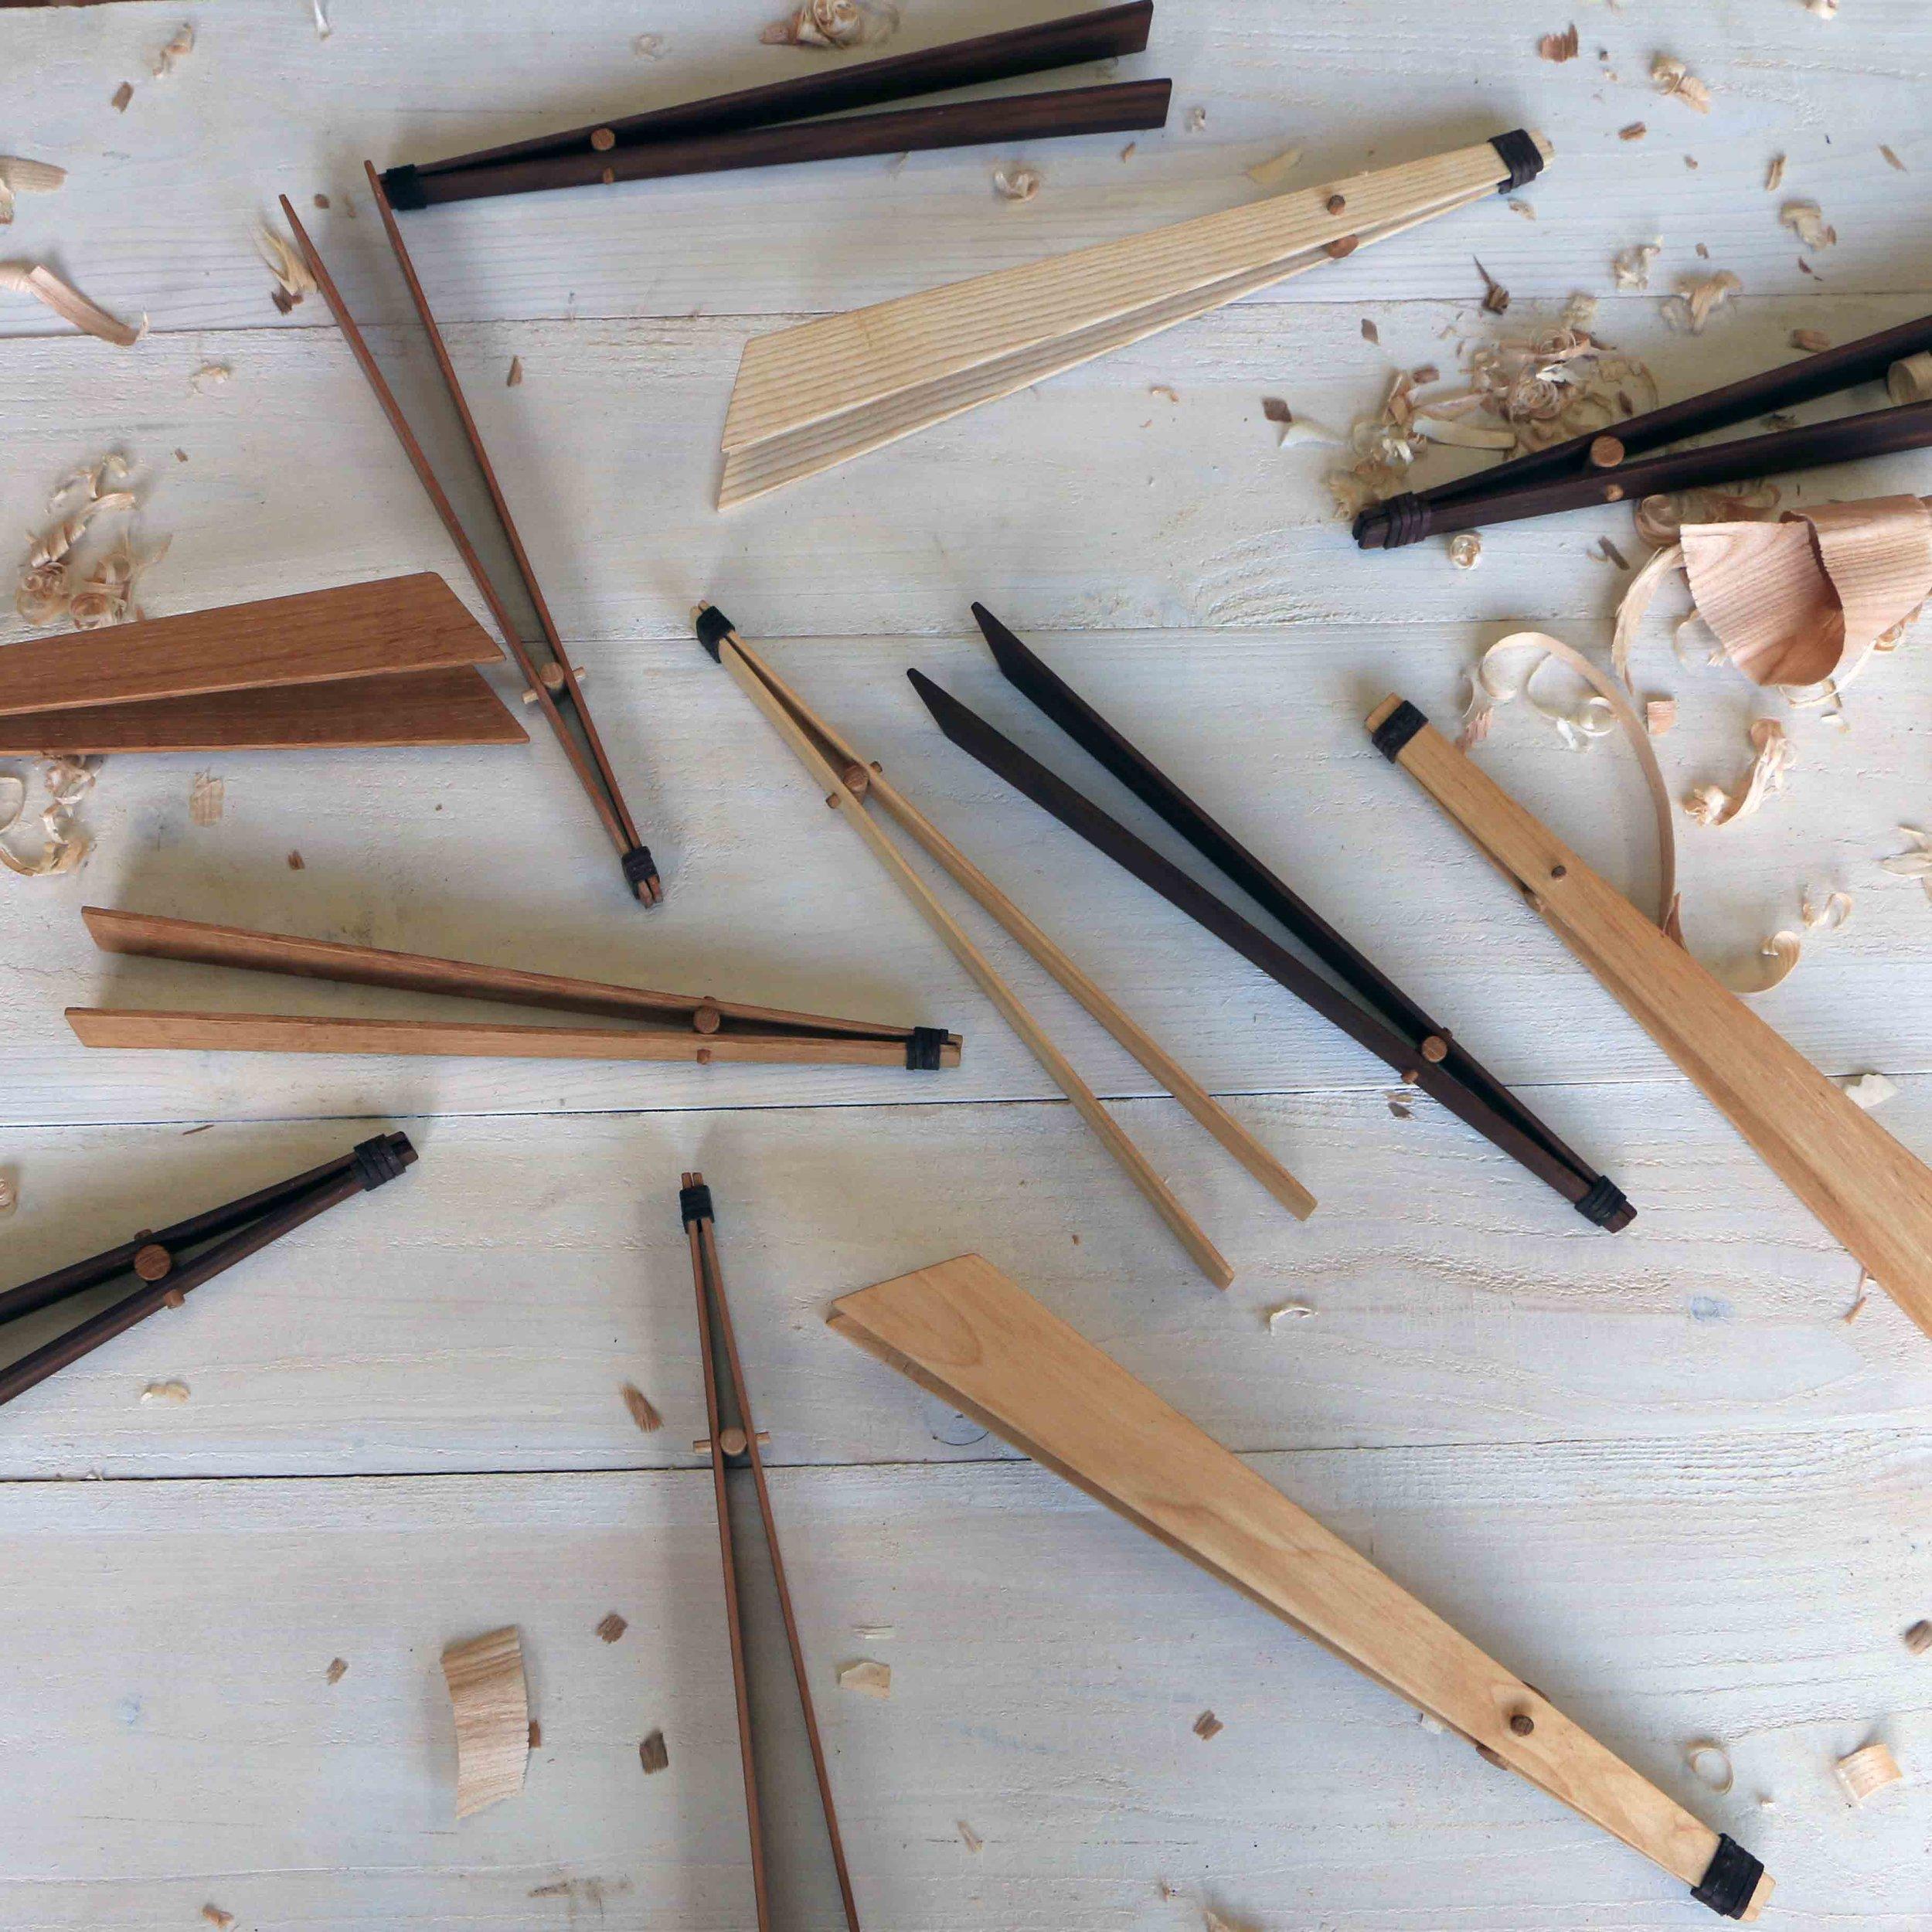 AMBROSE VEVERS      Woodworker, Craft teacher, Furniture Maker, Carpenter, Sawmill owner, Musician, woodworking courses. Based in Ashburton.